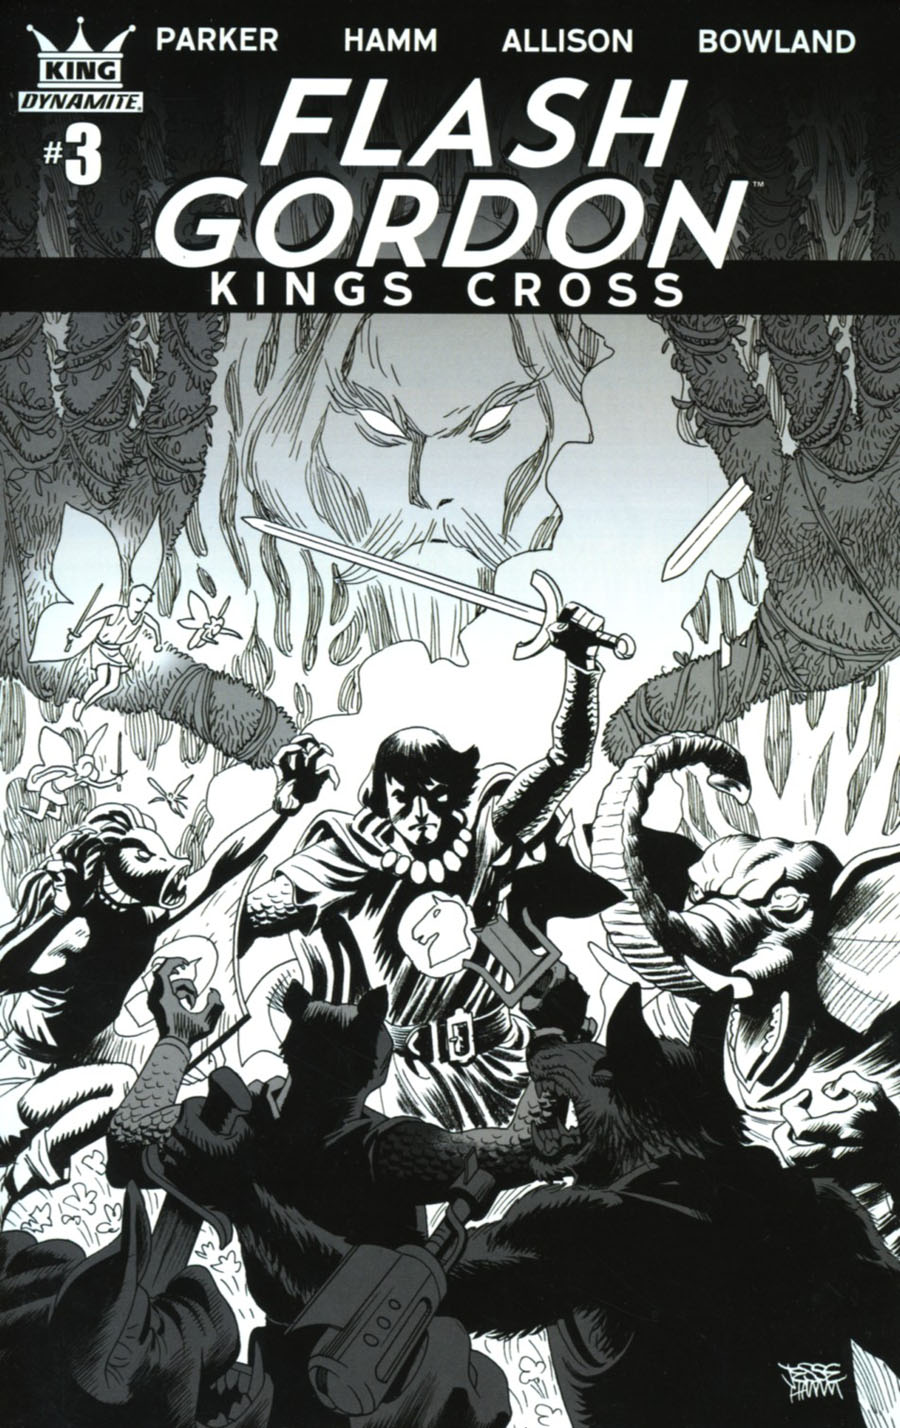 Flash Gordon Kings Cross #3 Cover D Incentive Jesse Hamm & Grace Allison Black & White Cover